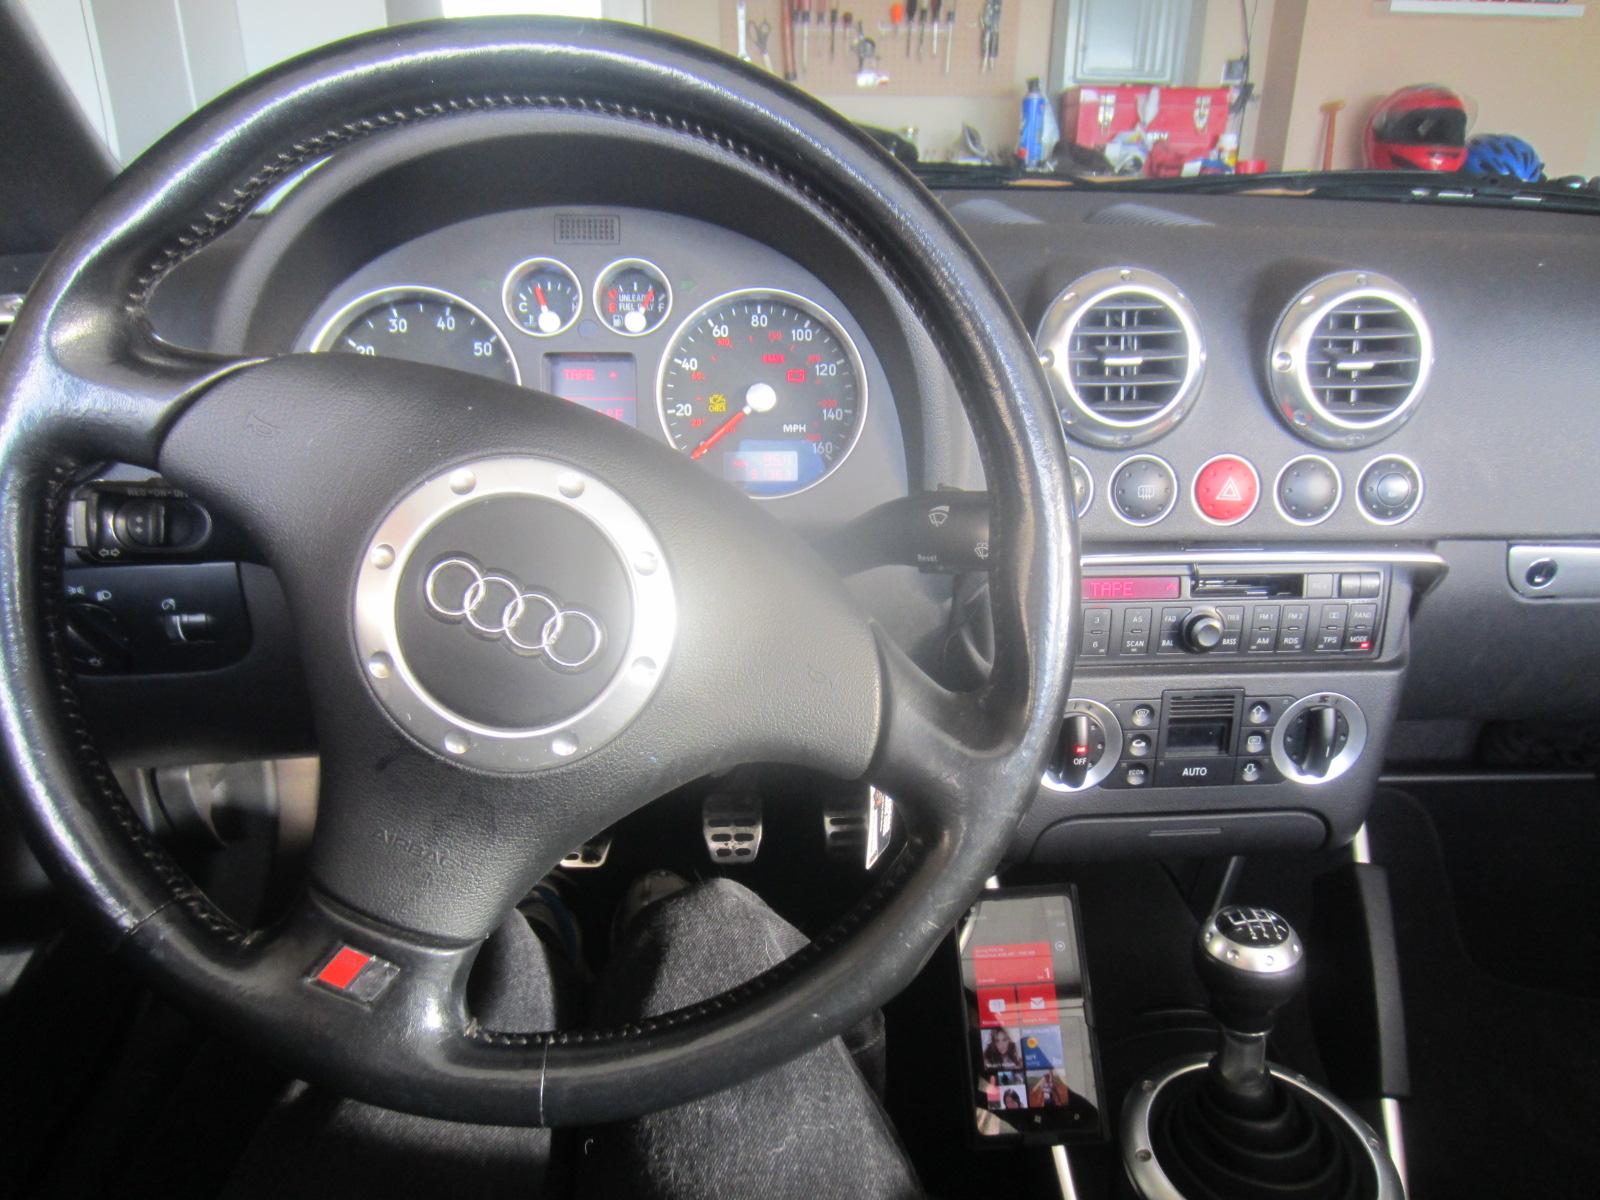 Smartphone Installation In An Audi Tt